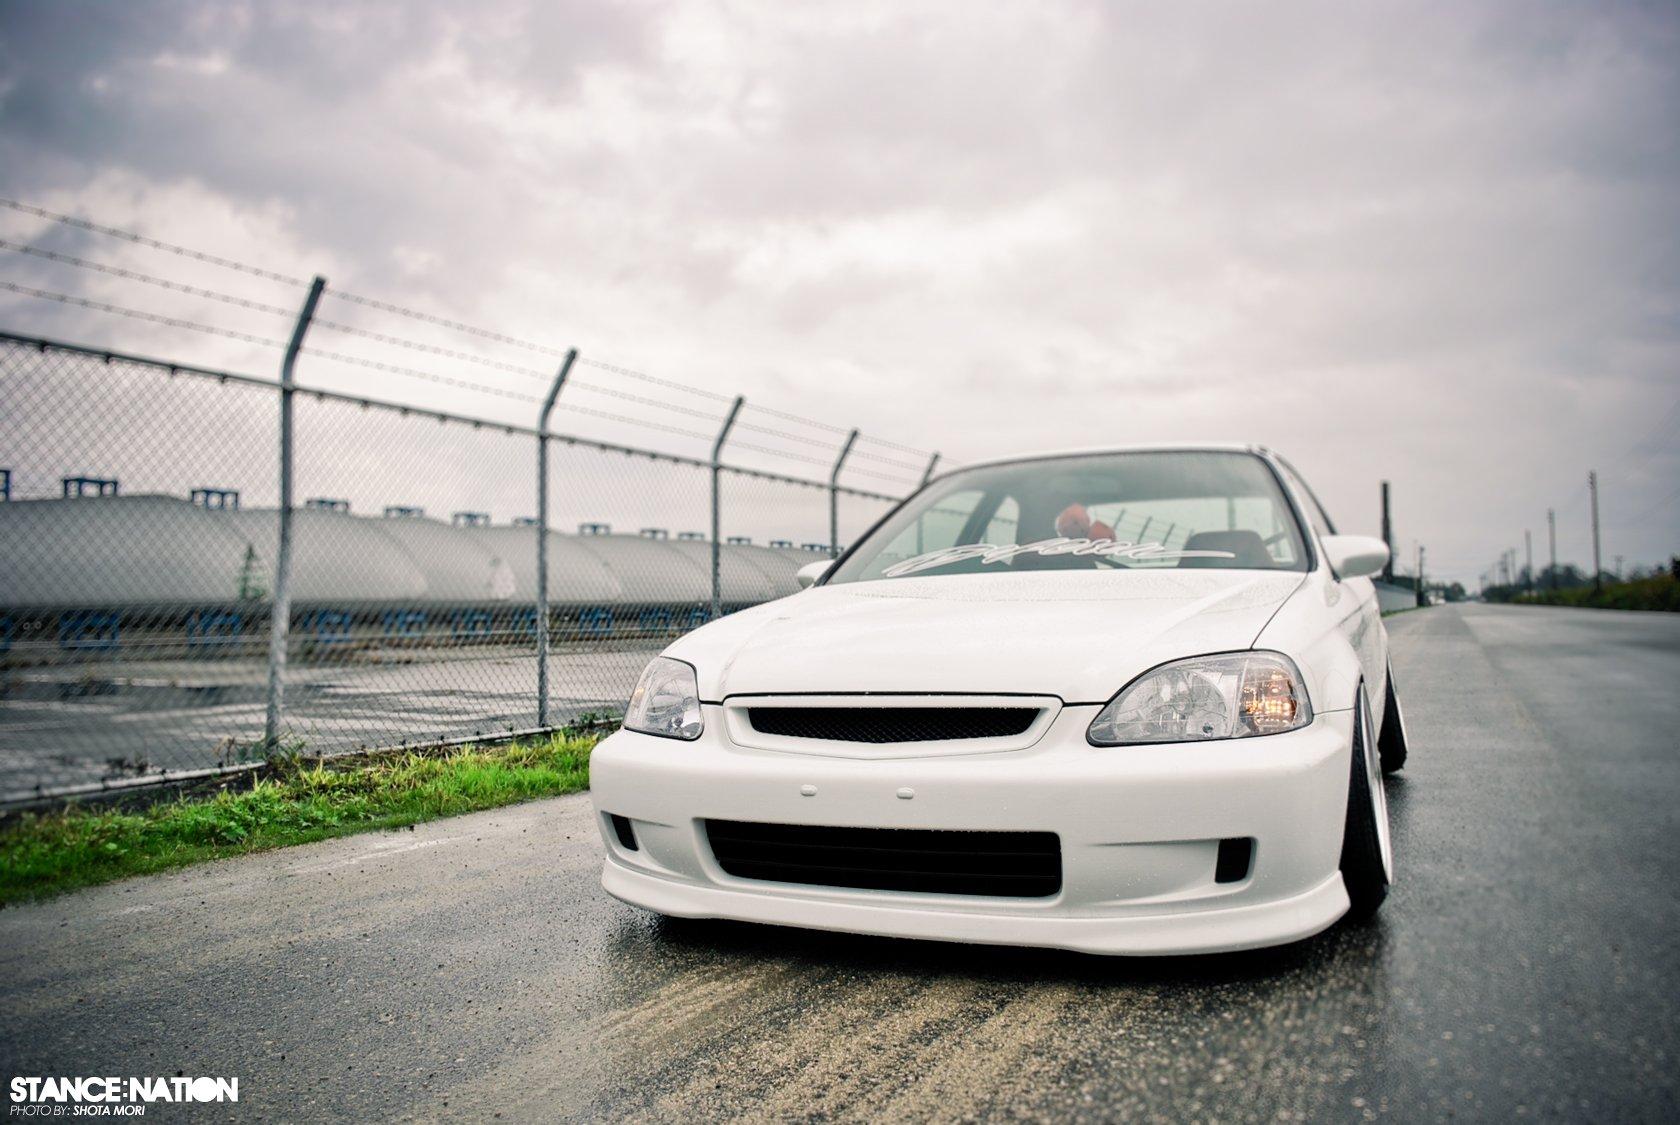 Honda Ek9 Civic Type R Tuning Custom Wallpaper 1680x1125